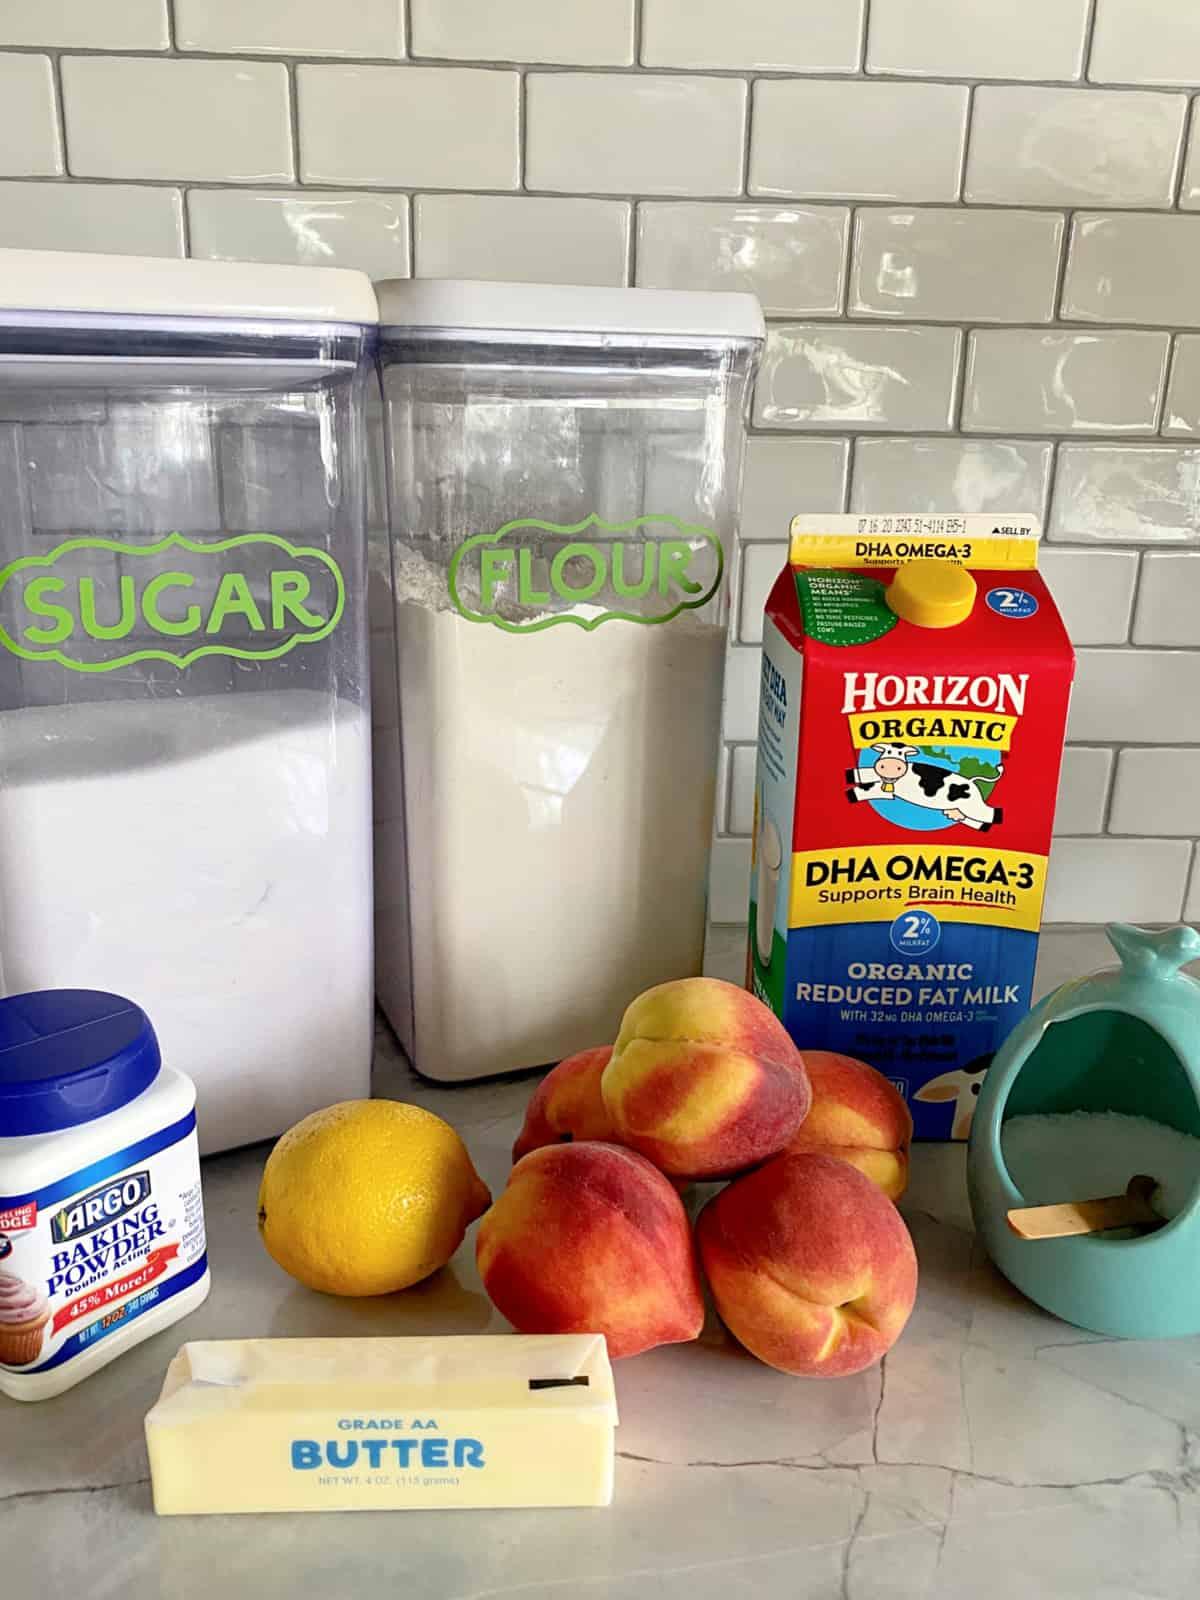 Ingredients on counter: Sugar, flour, baking powder, butter, lemon, peaches, milk, and salt.